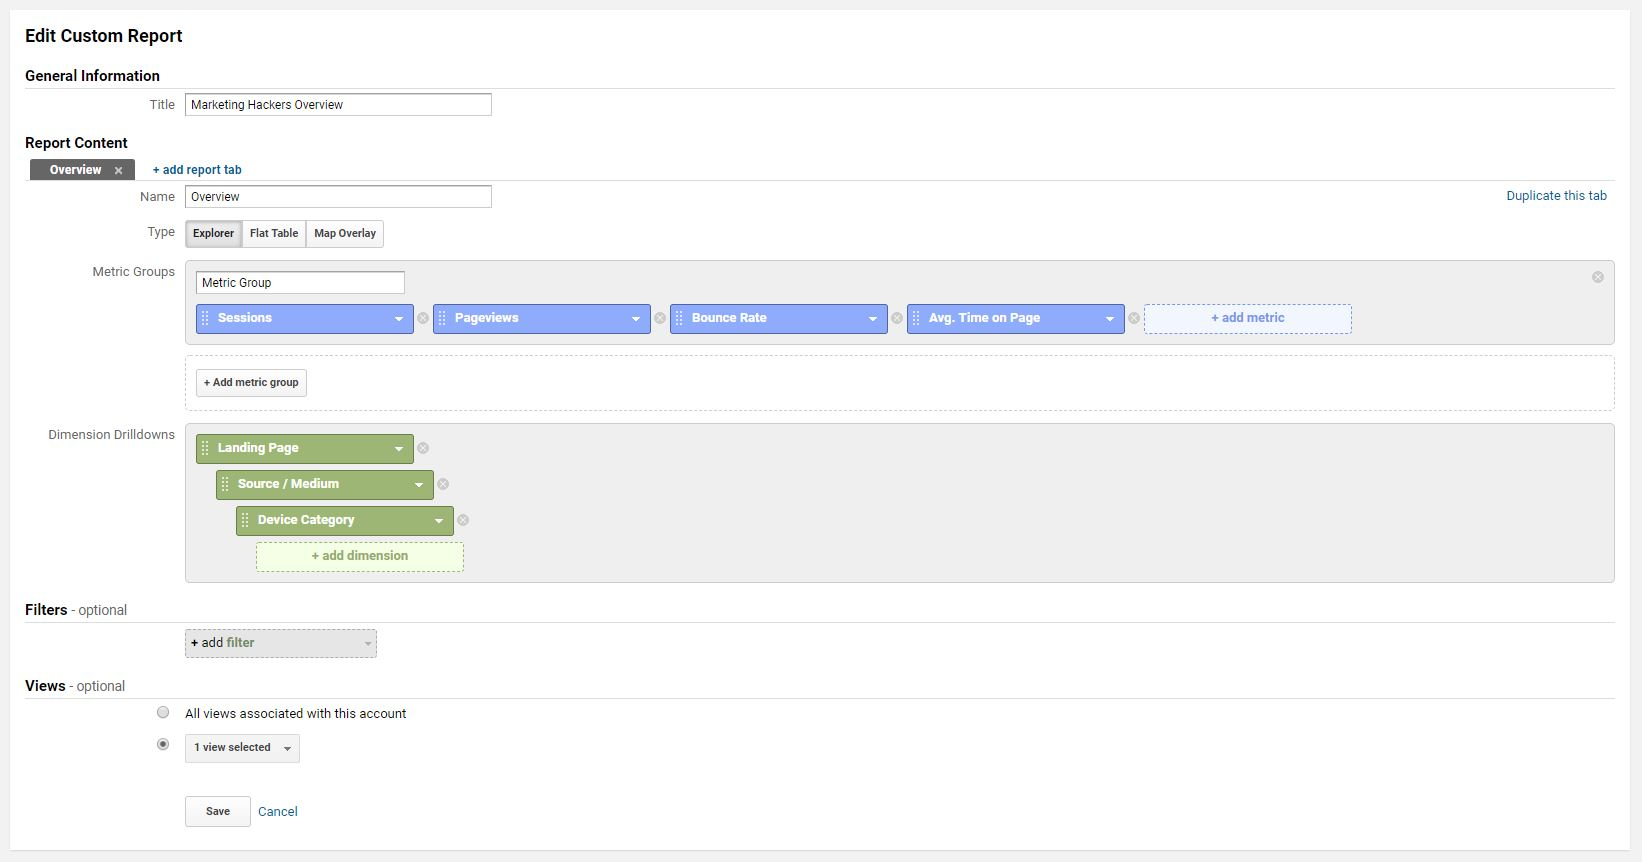 ga google analytics custom report settings overview marketing hackers